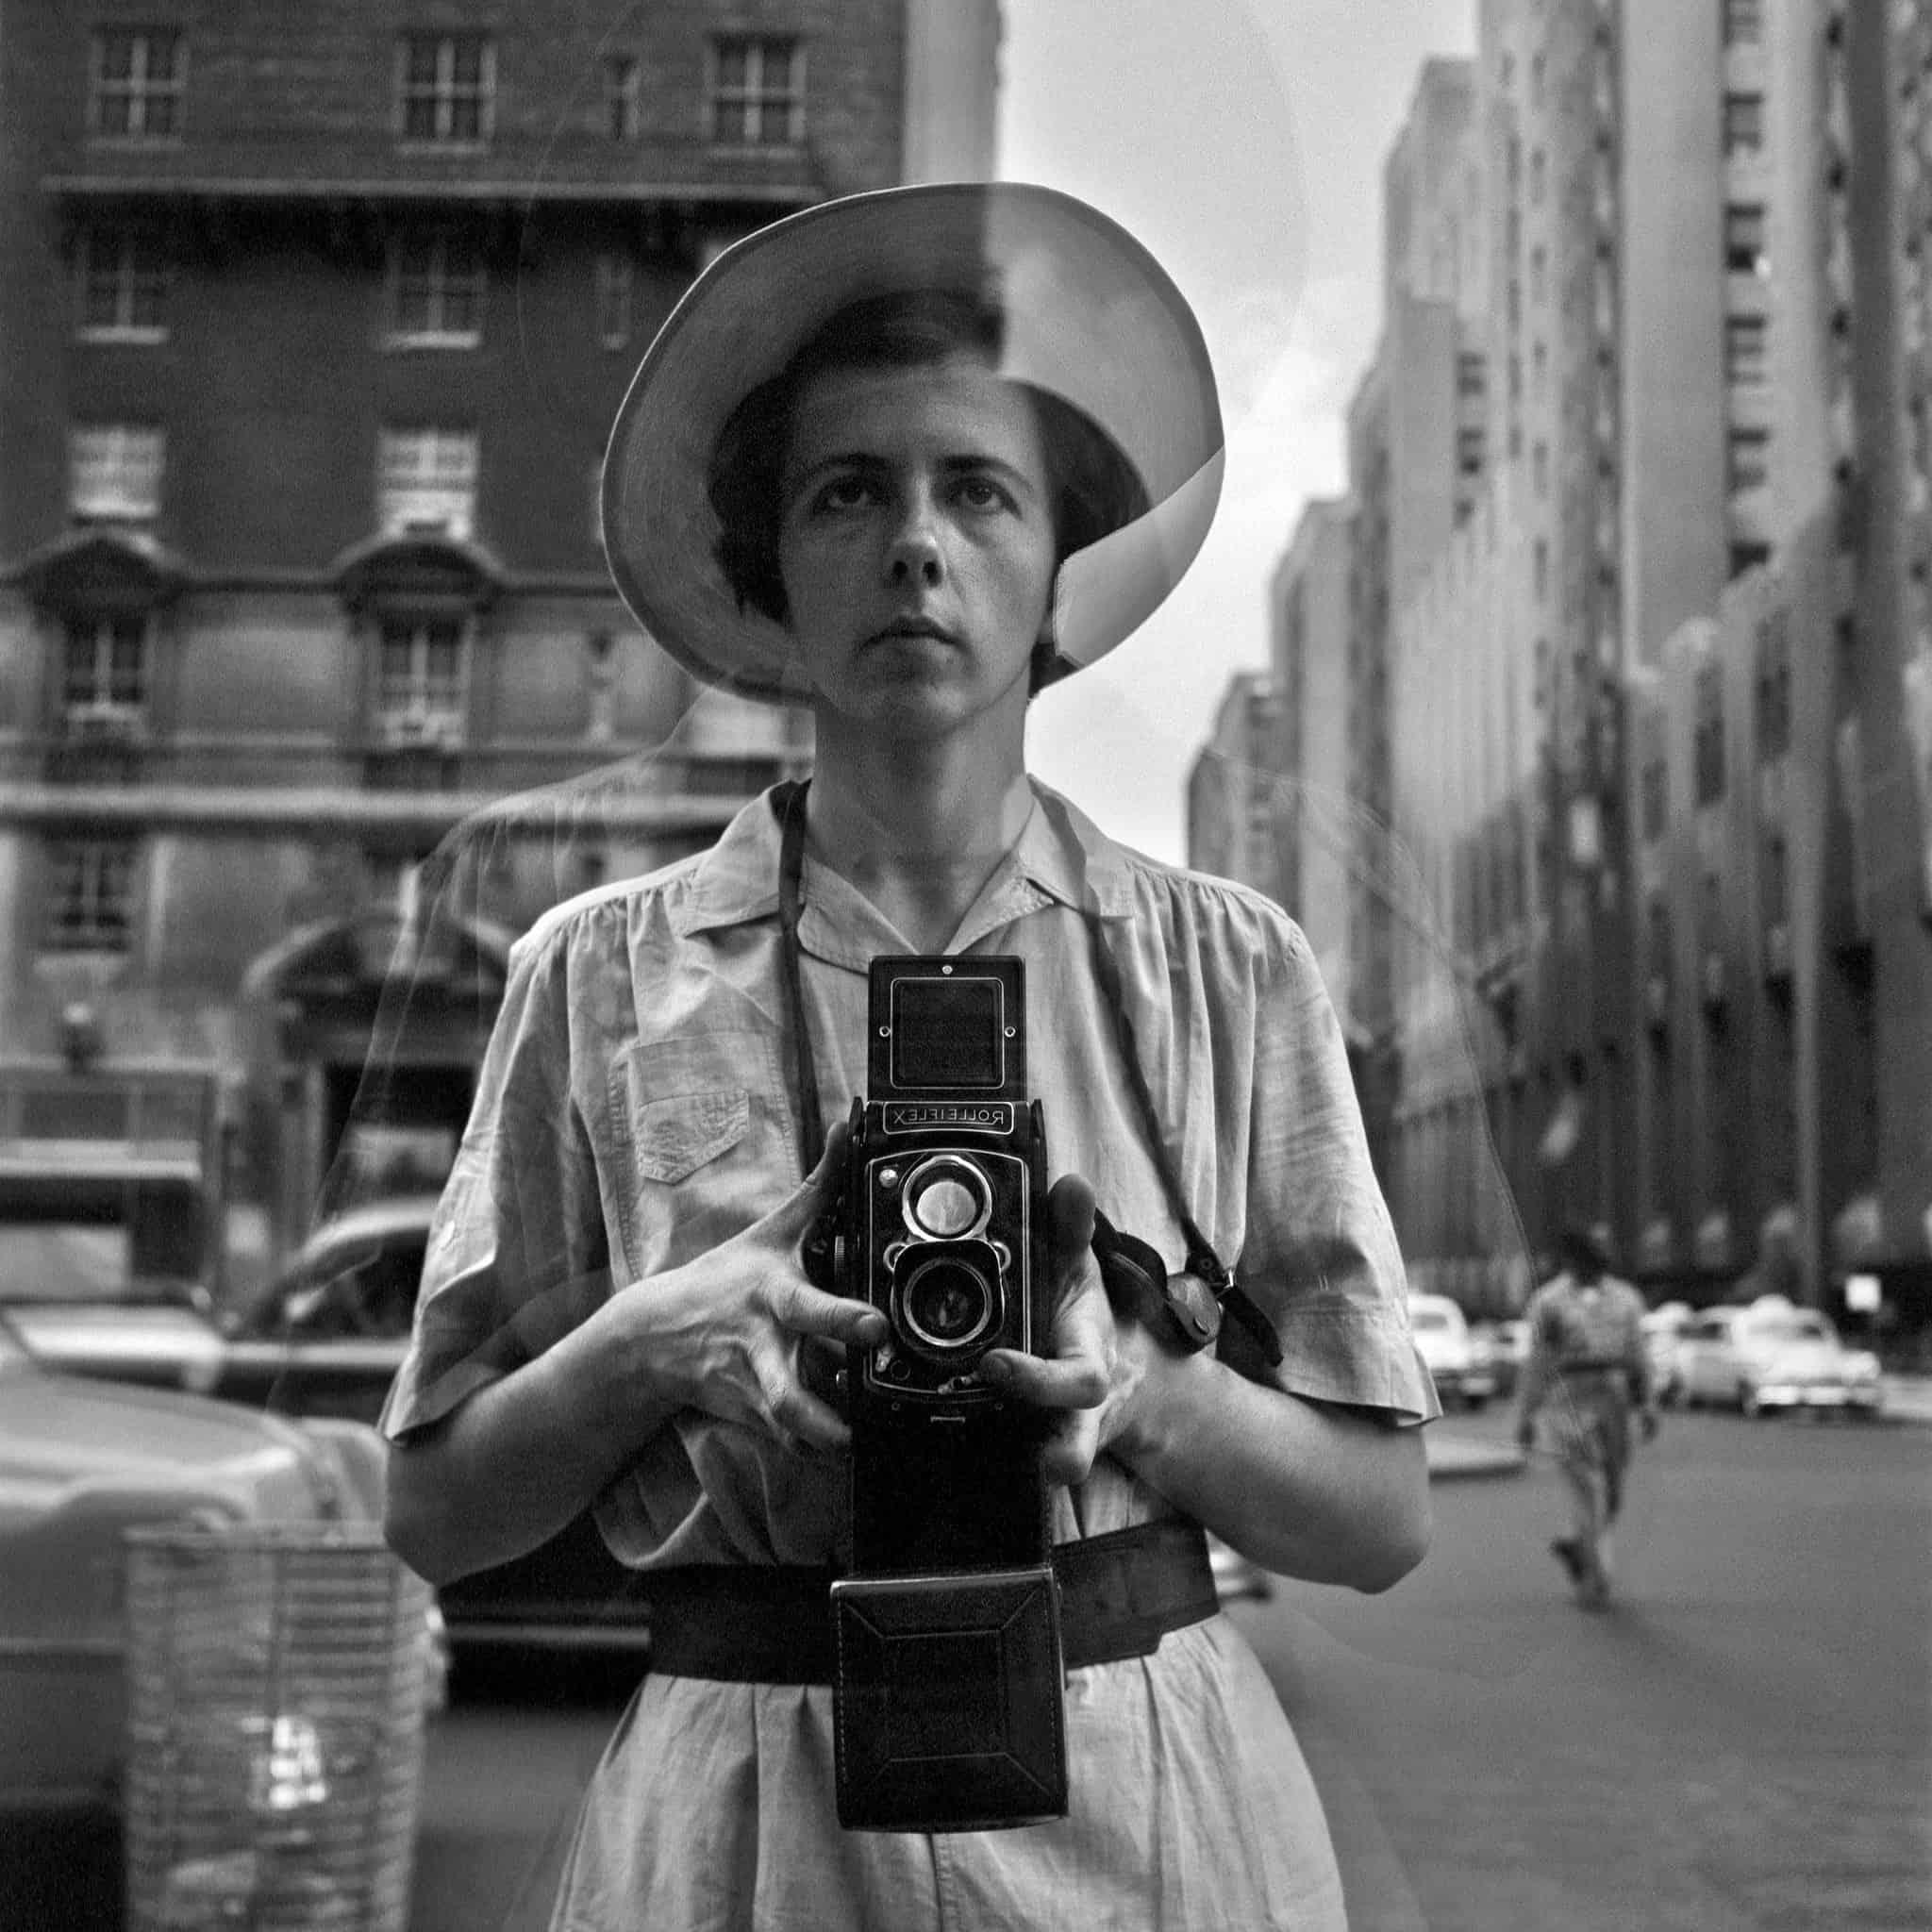 autoritratto fotografico, Vivian maier, self portrait